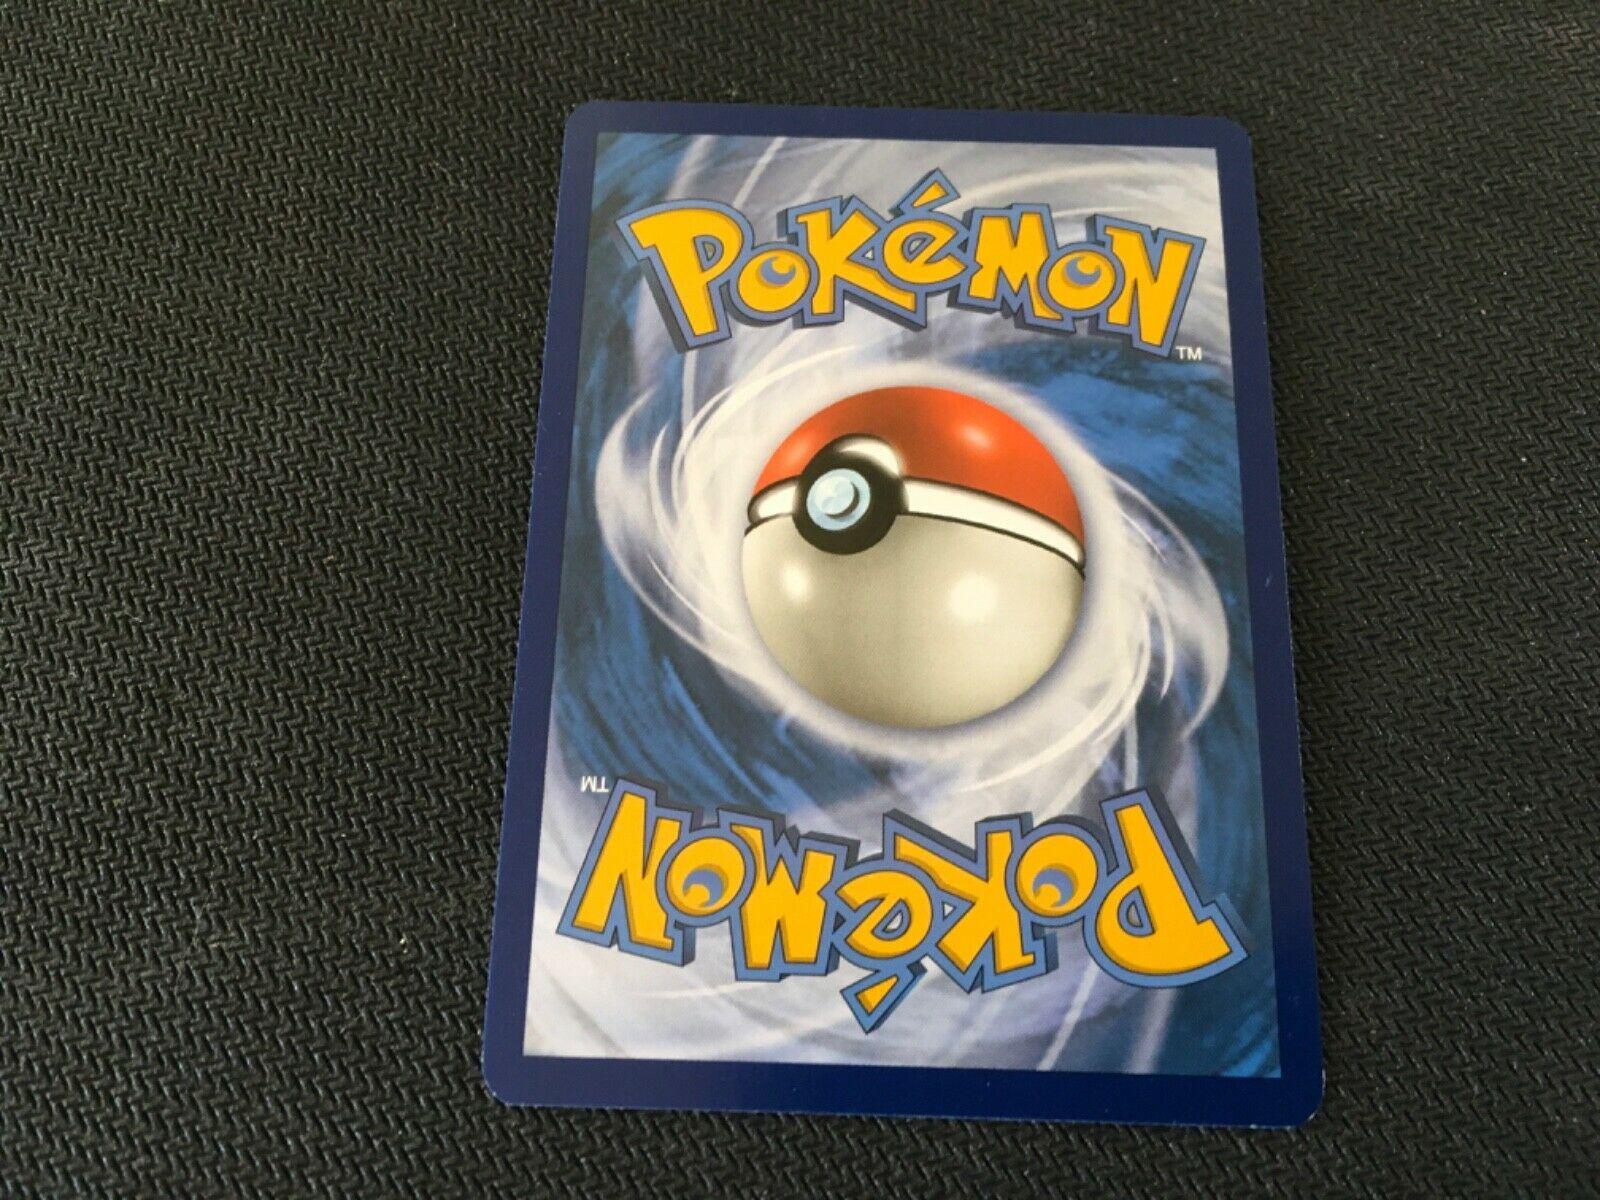 Buzzwole Rare Holo League Promo Pokemon Card Trainer Item Forbidden Light 77/131 - Image 7